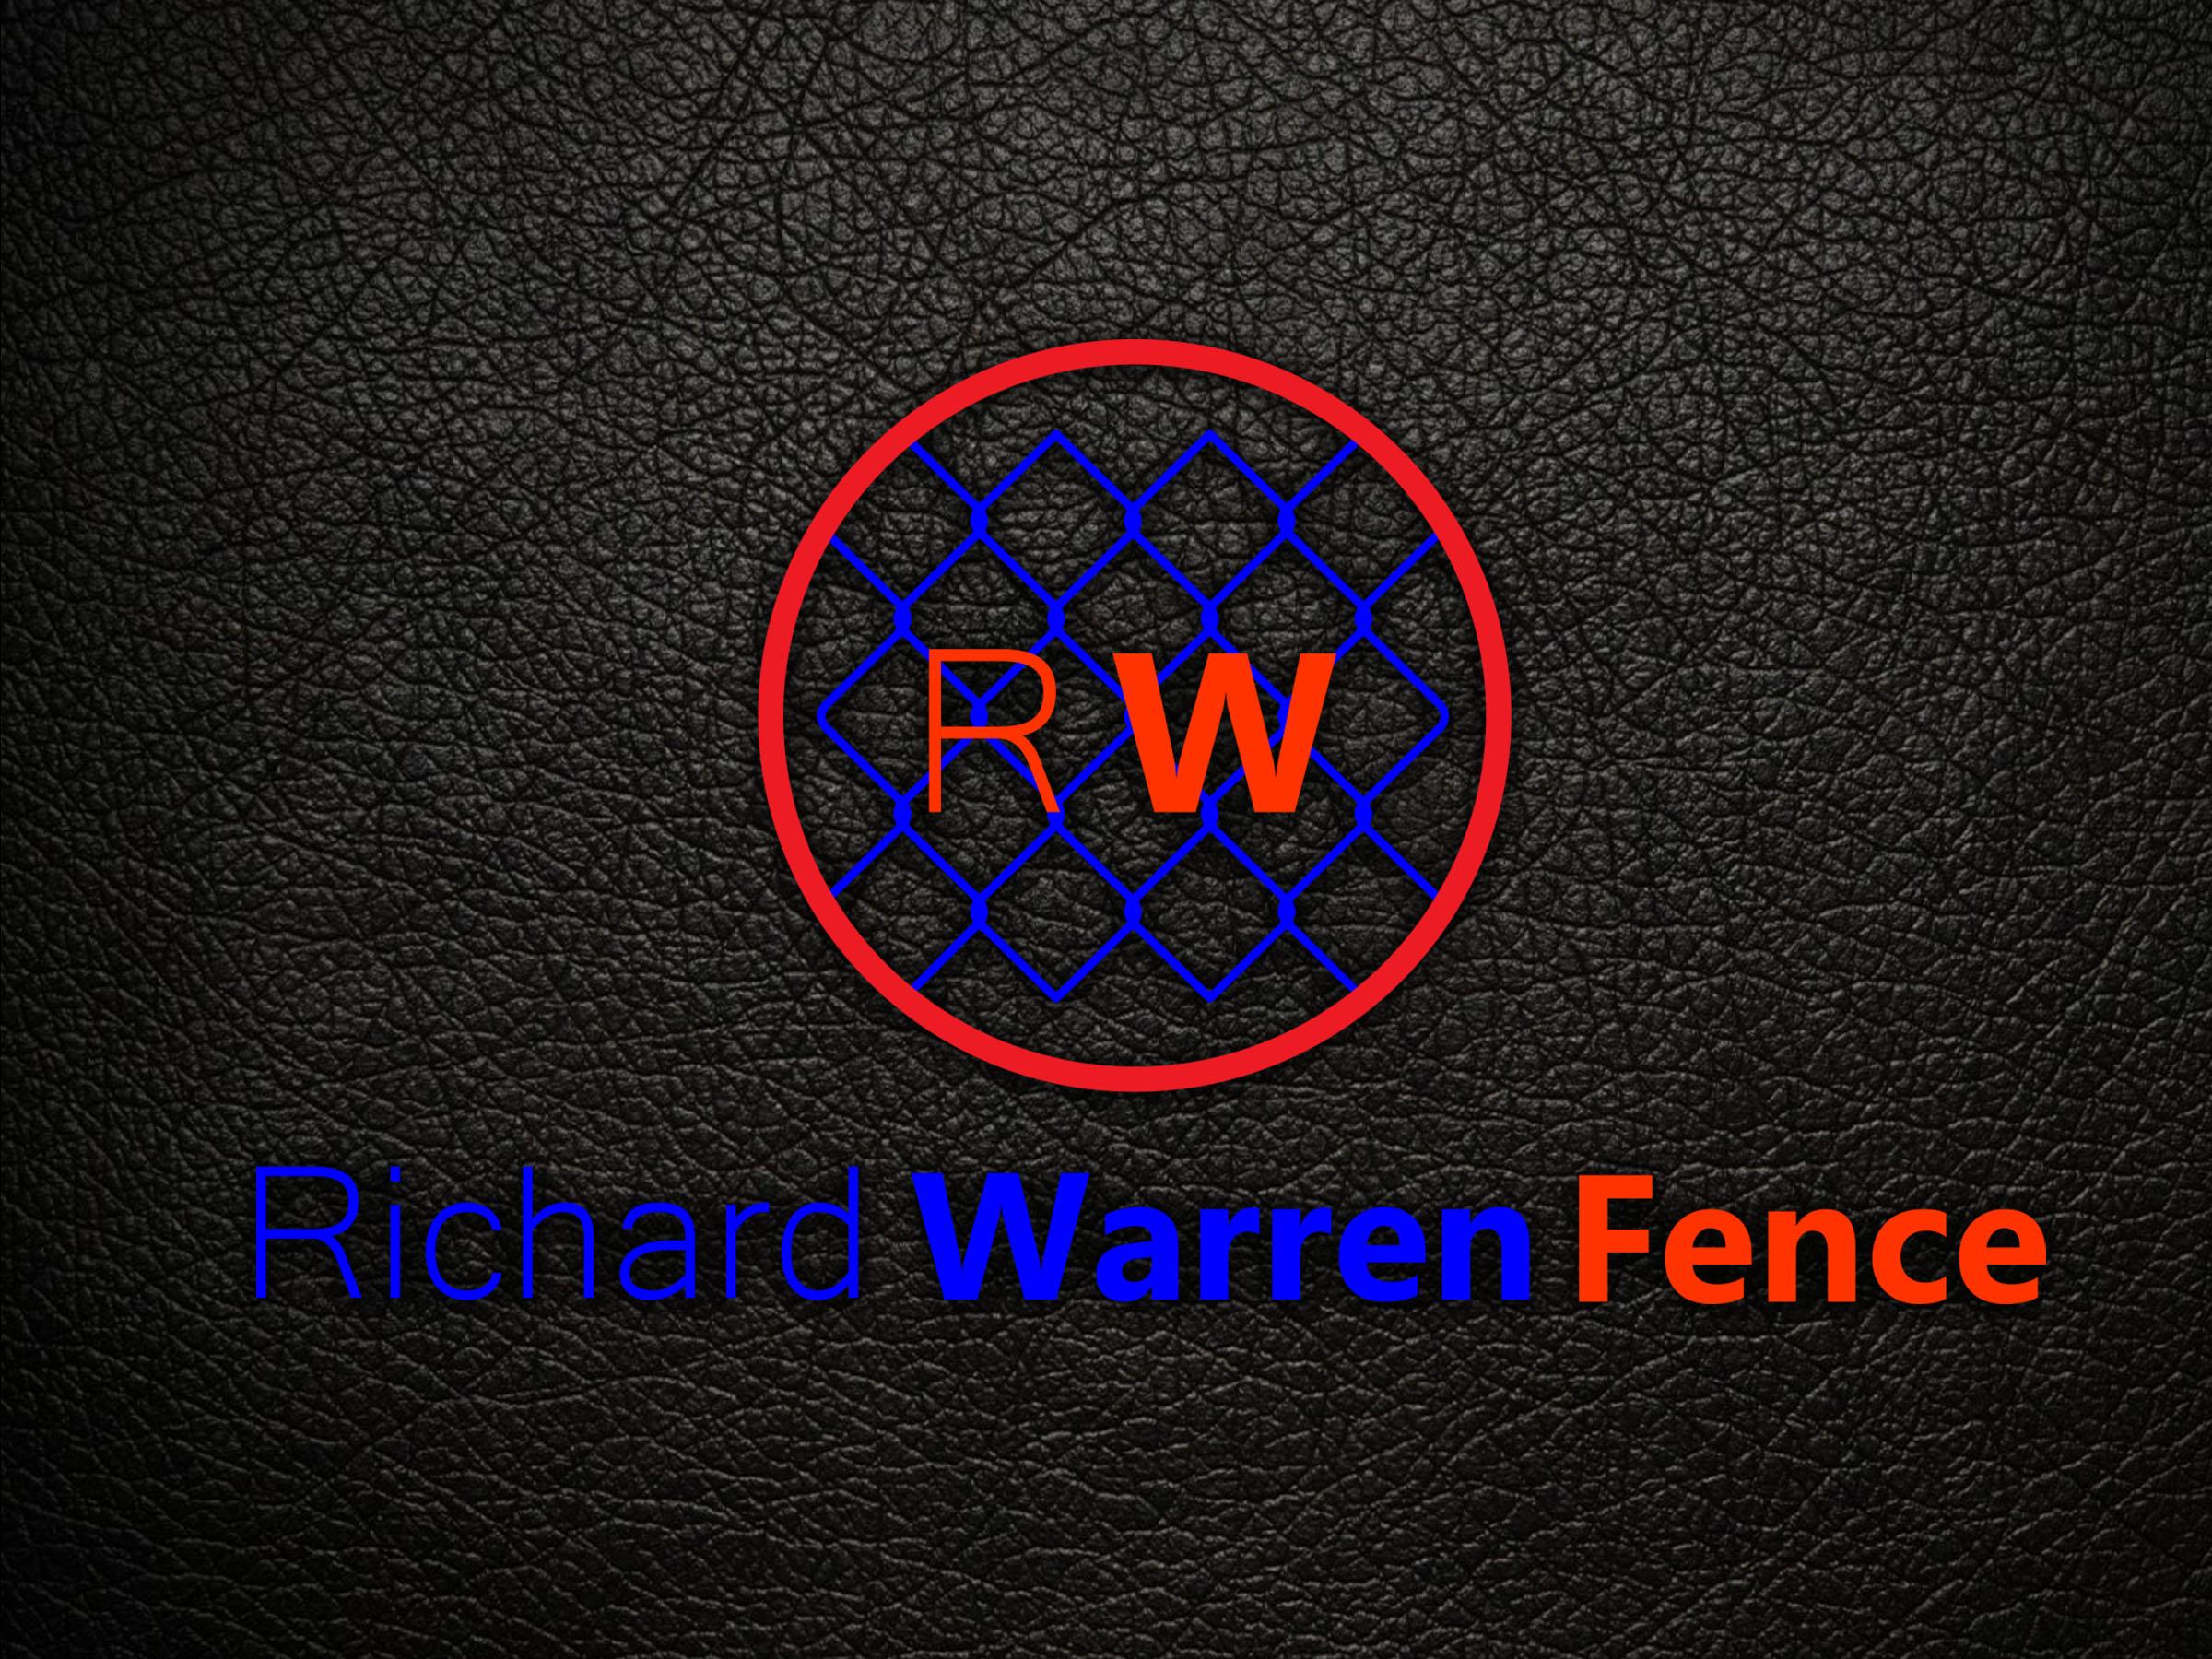 Richard Warren Fence Company